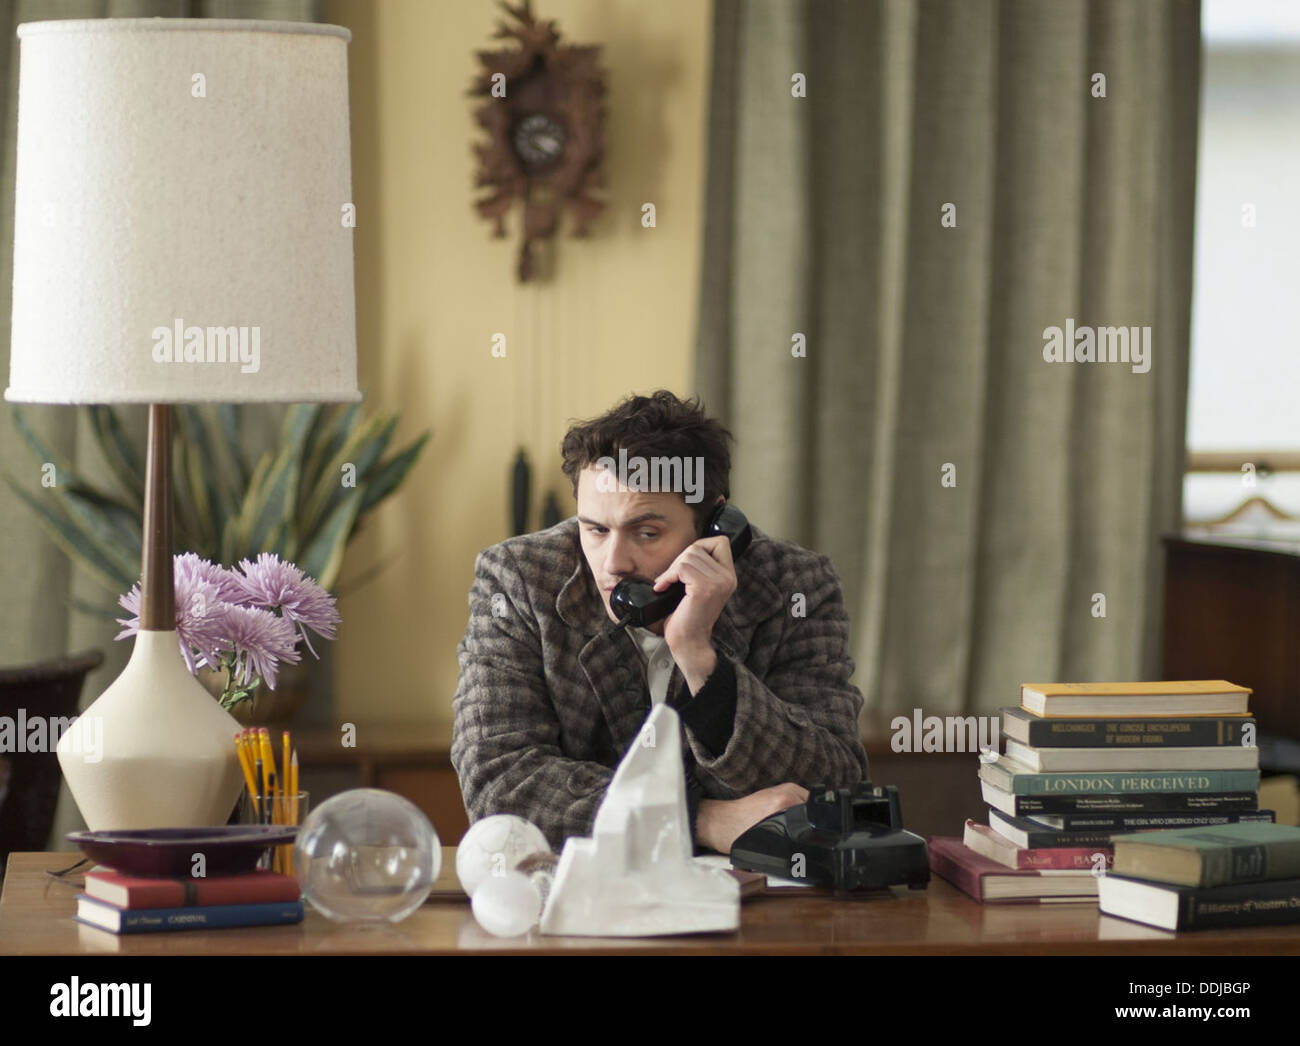 KRANKHEITEN (2012) JAMES FRANCO CARTER (DIR) 001 MOVIESTORE SAMMLUNG LTD Stockbild